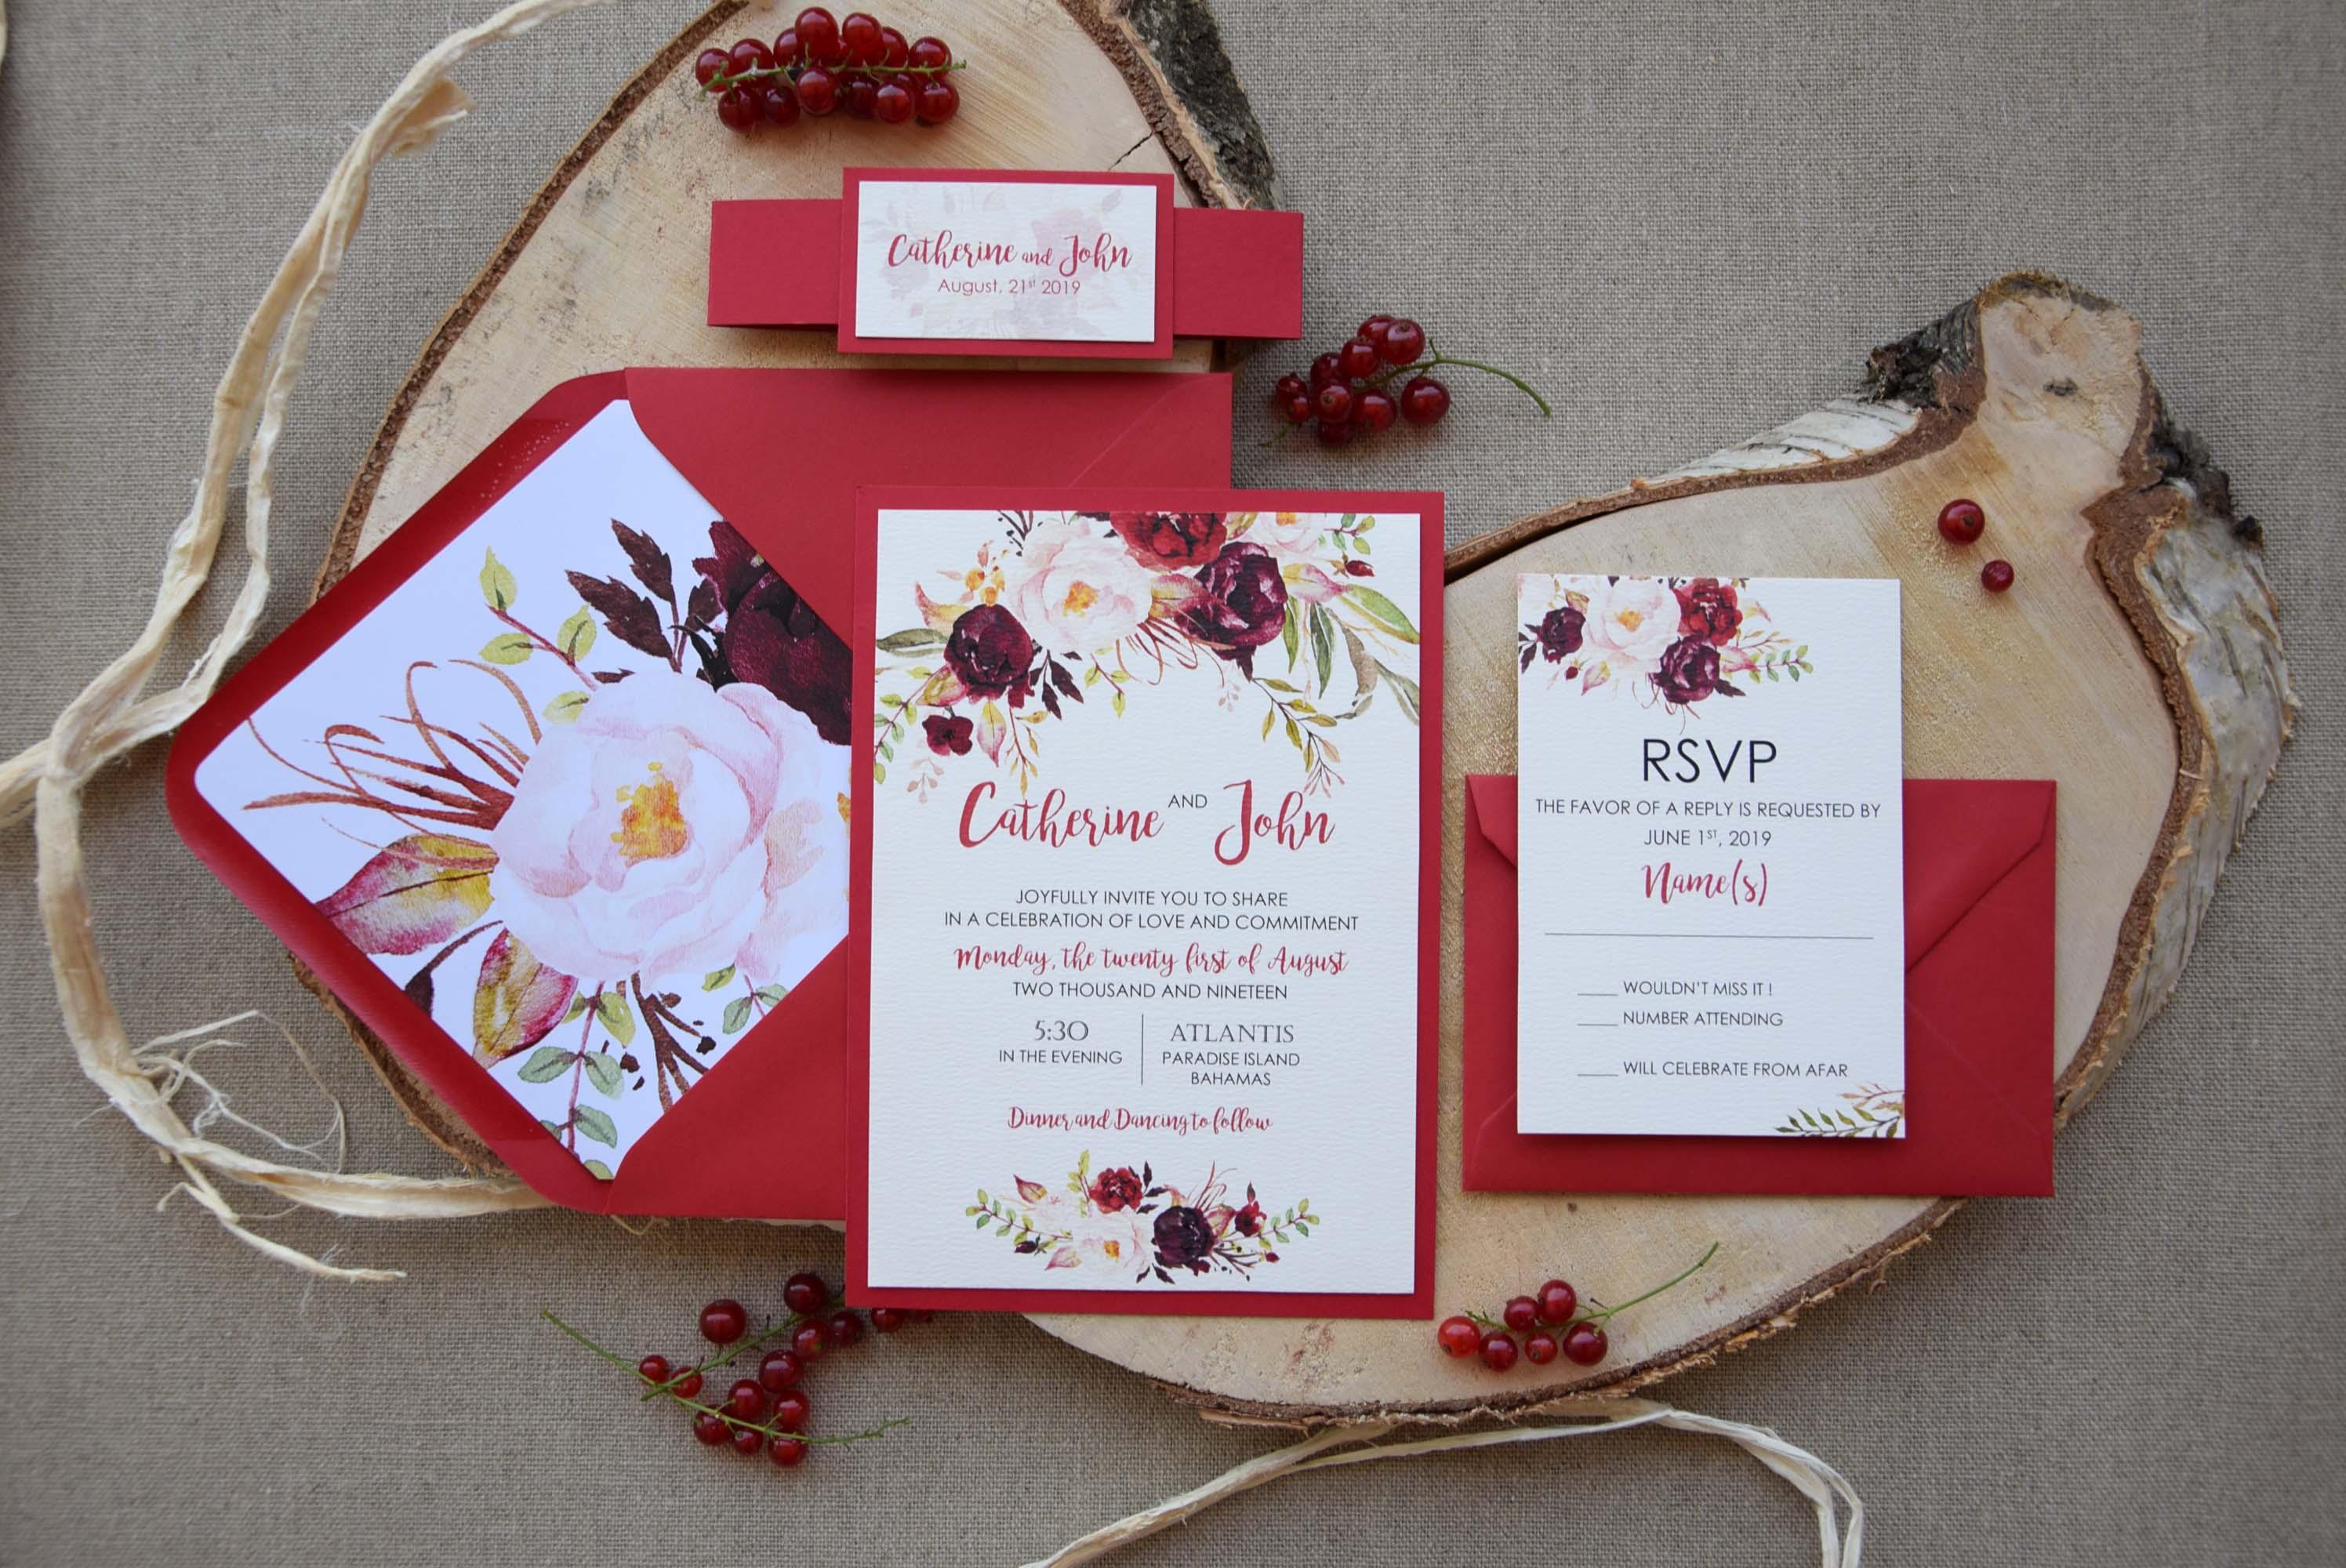 Dorable Shabby Chic Wedding Invites Model - Invitations and ...